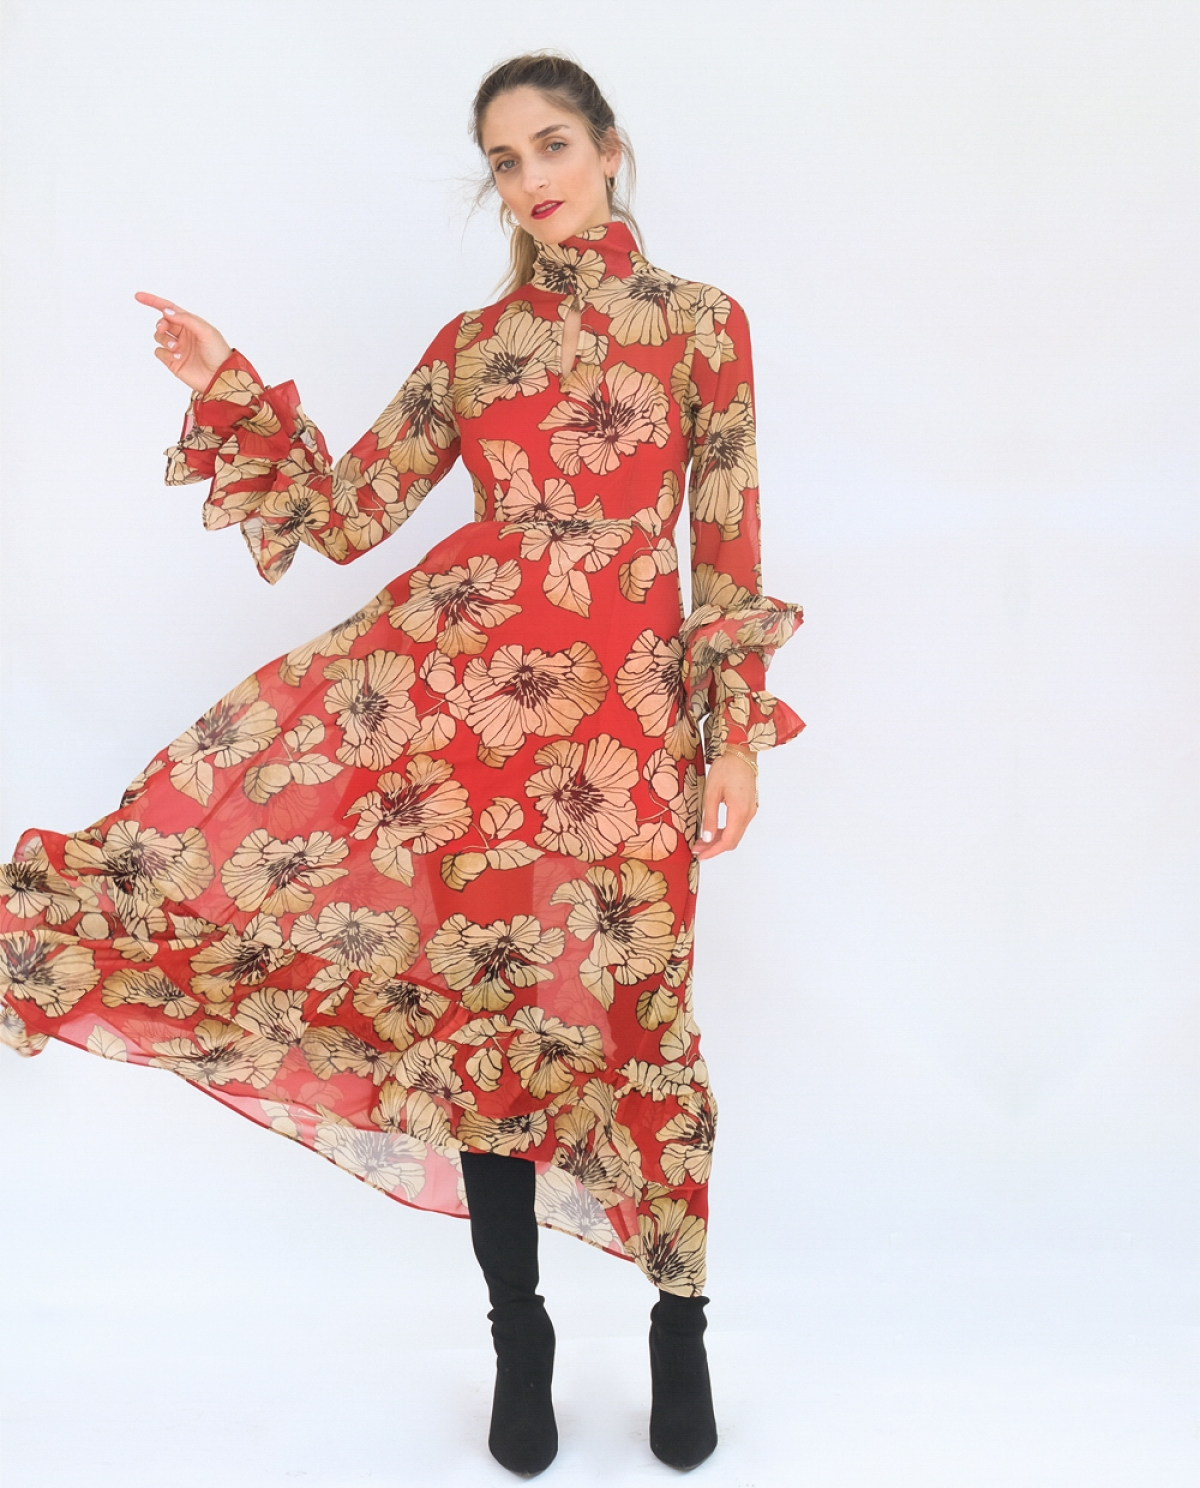 Charlotte Printed Ruffled Dress